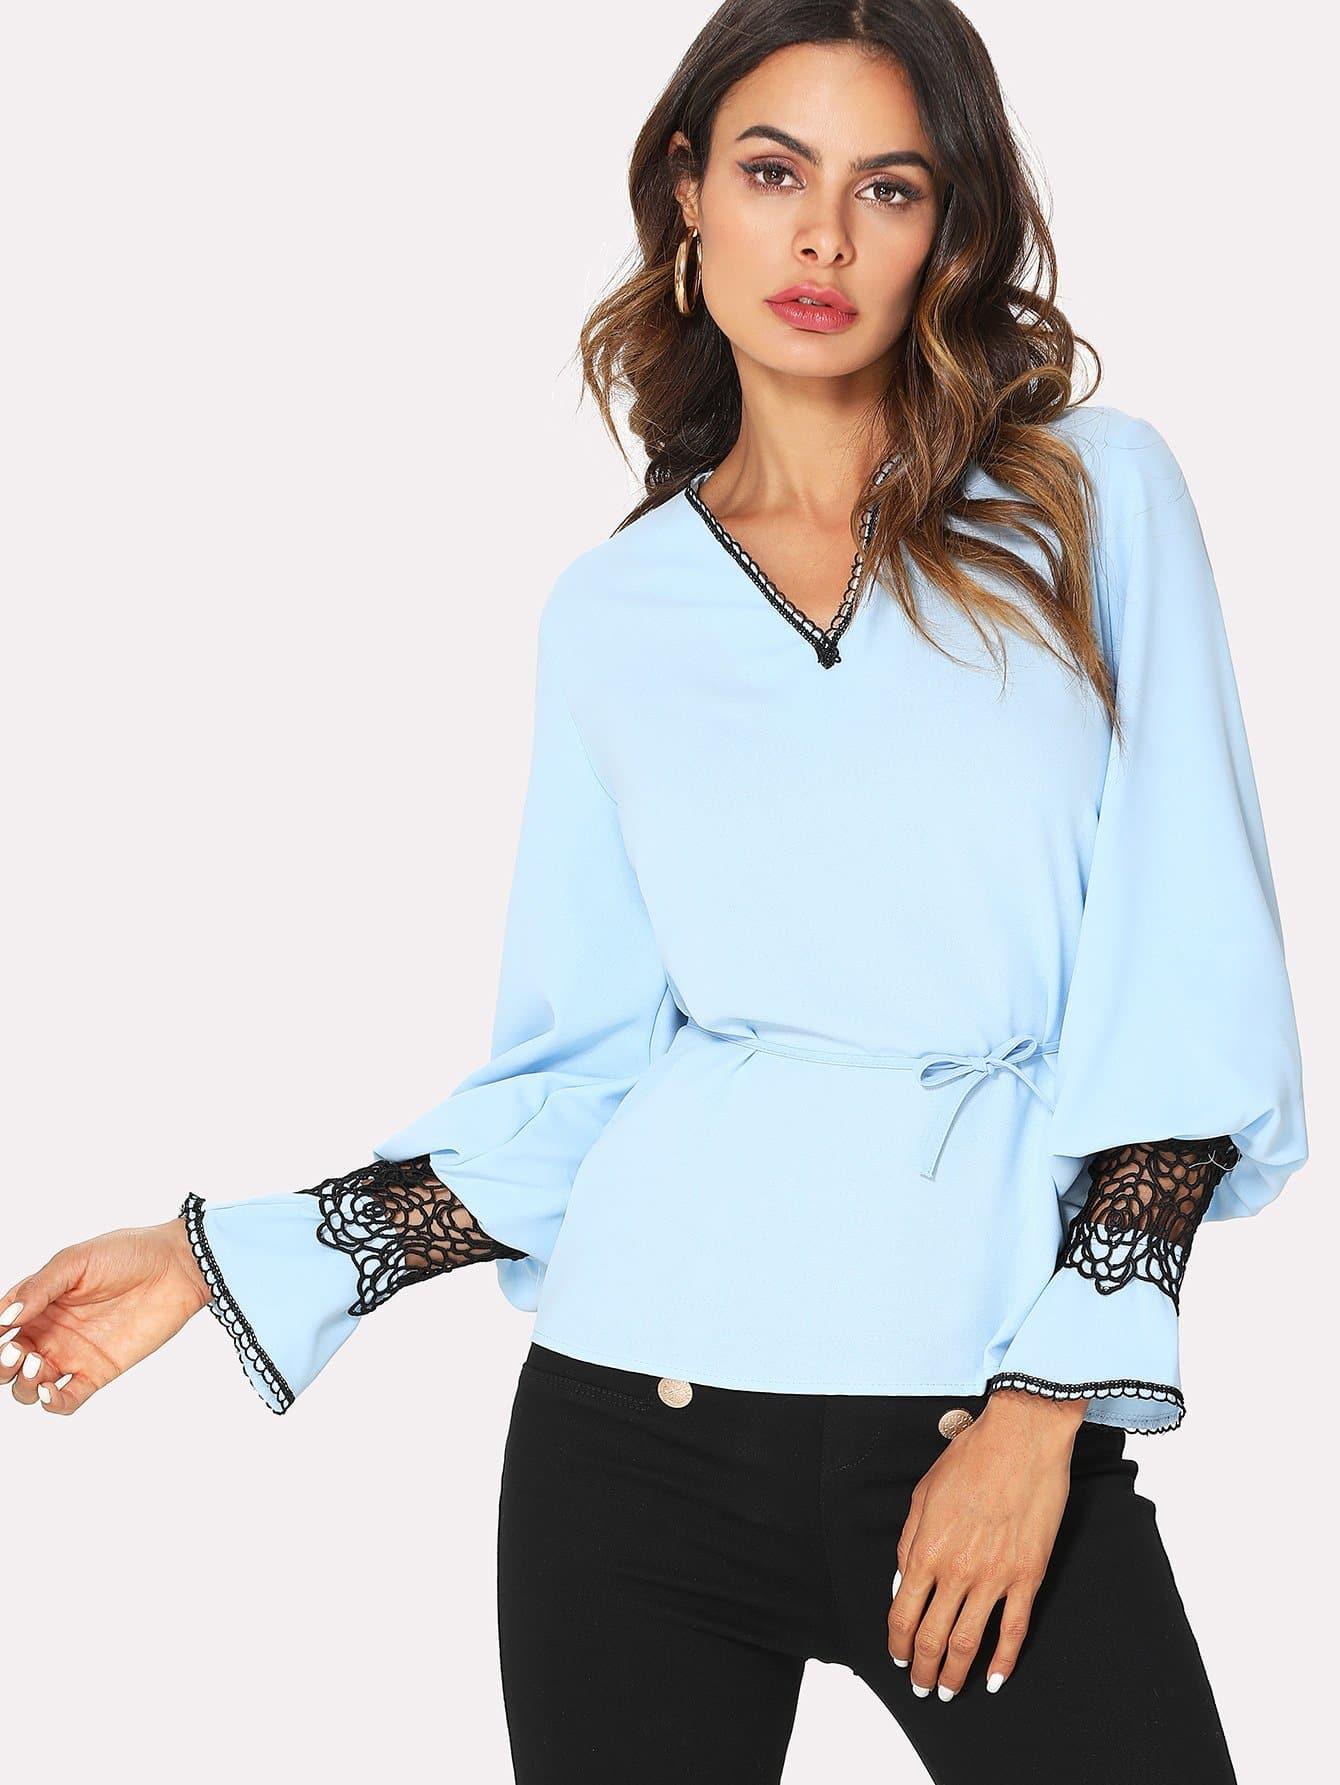 Flounce Sleeve Lace Contrast Top mesh contrast flounce sleeve top